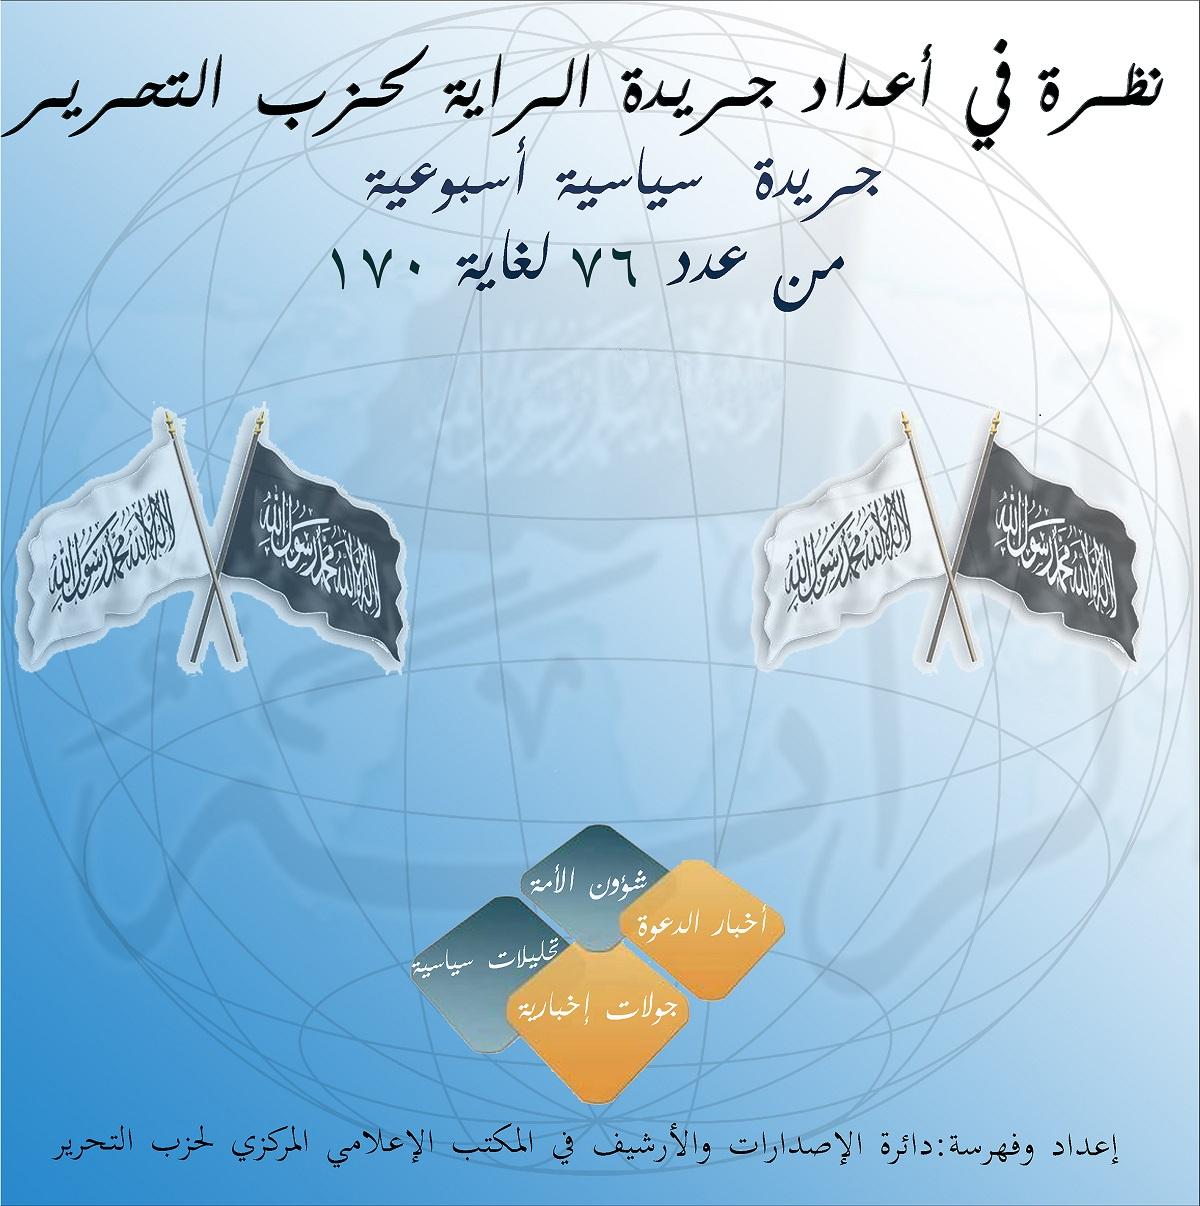 alRayah 3rd DVD 76 170 Rajab 2018 Cover